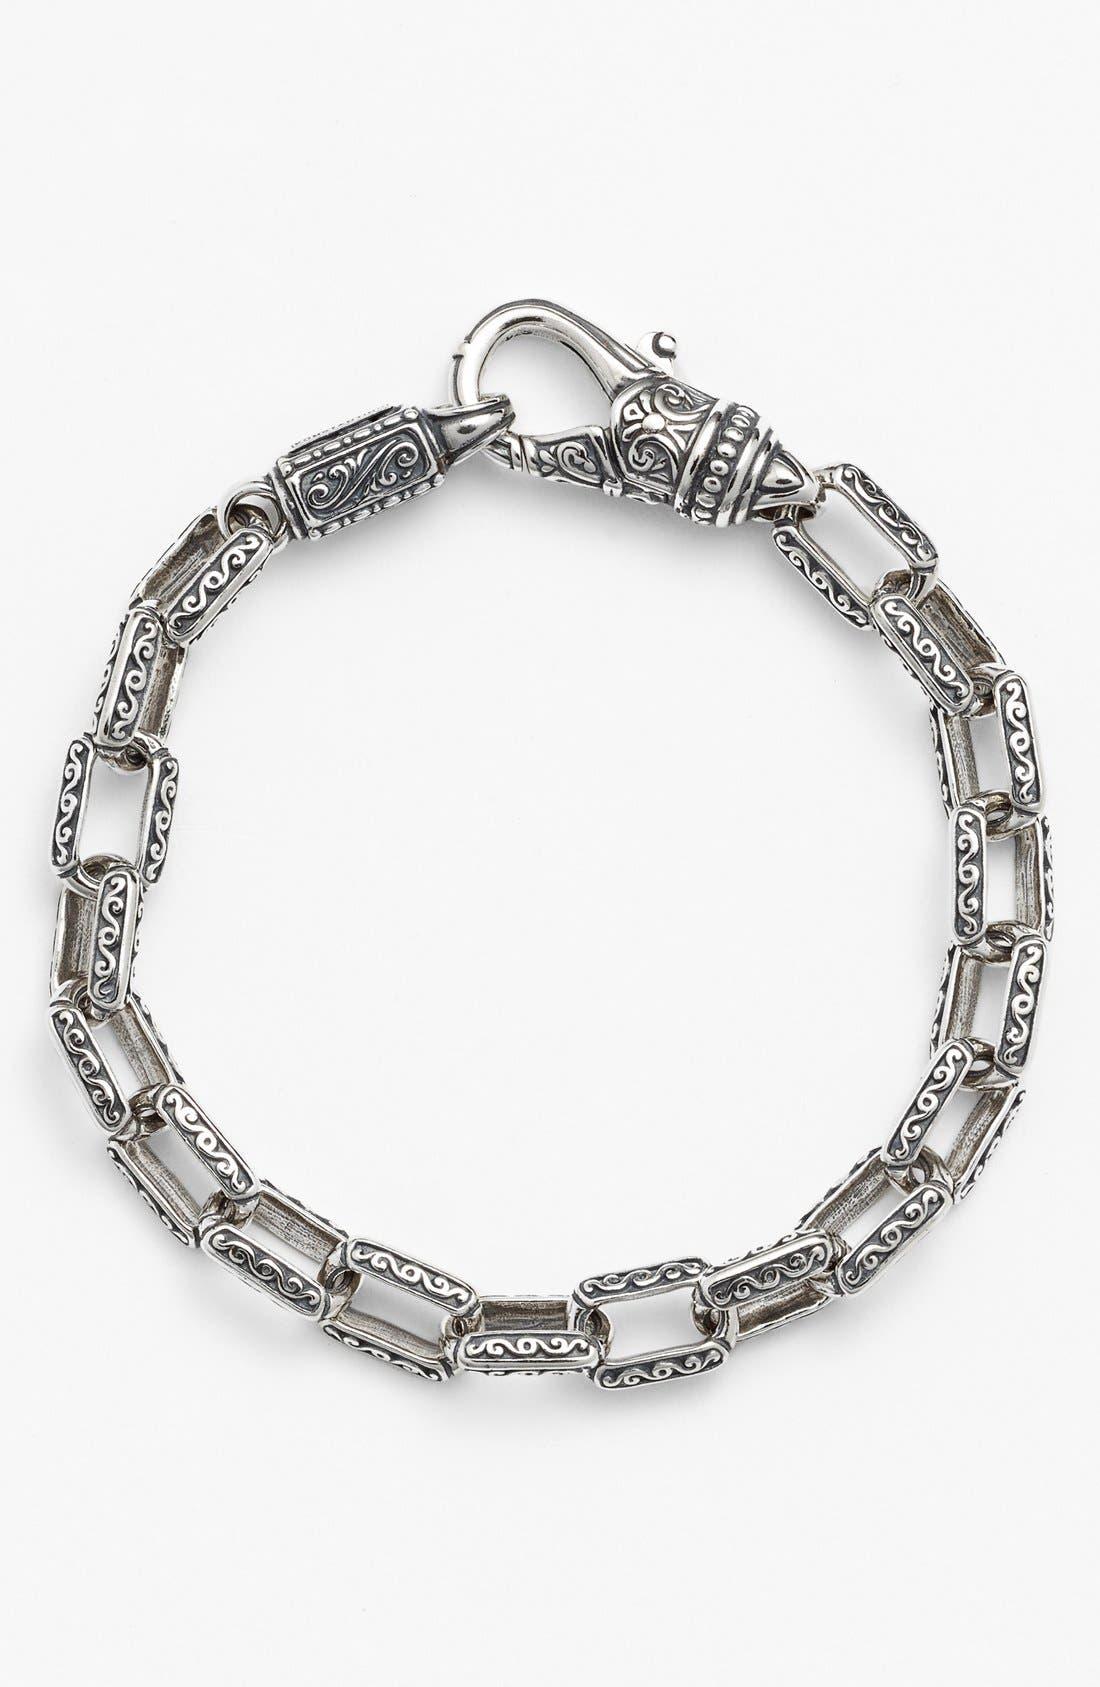 KONSTANTINO Classics Etched Link Bracelet